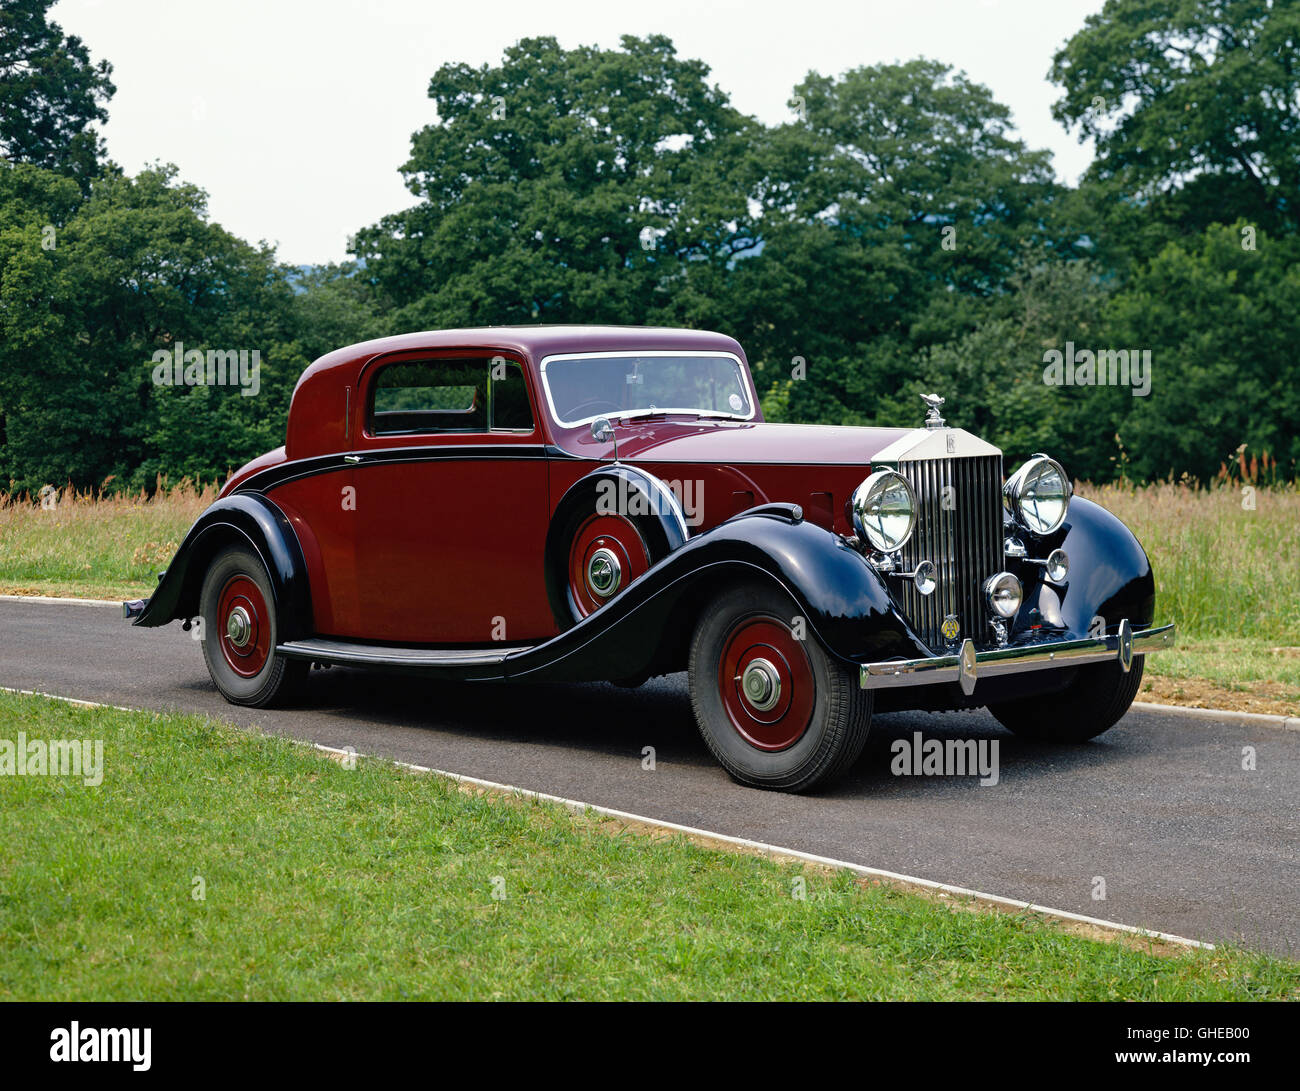 1938 Rolls Royce Phantom III V12 2 door fixed head coupe Country of origin United Kingdom - Stock Image